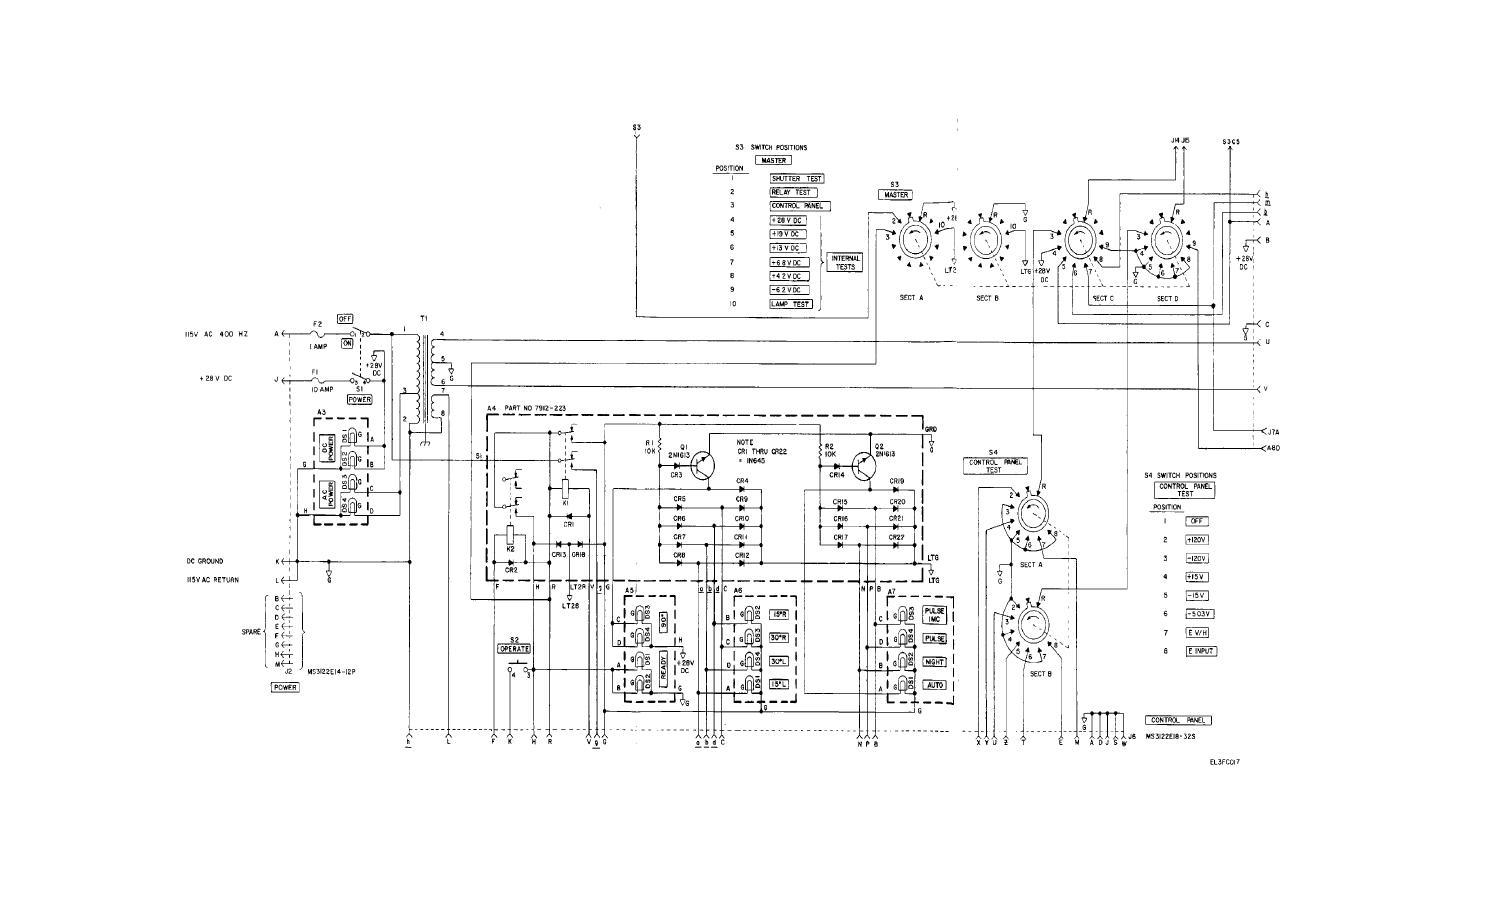 Fo 5 Shutter Test Set Overall Schematic Diagram Sheet 3